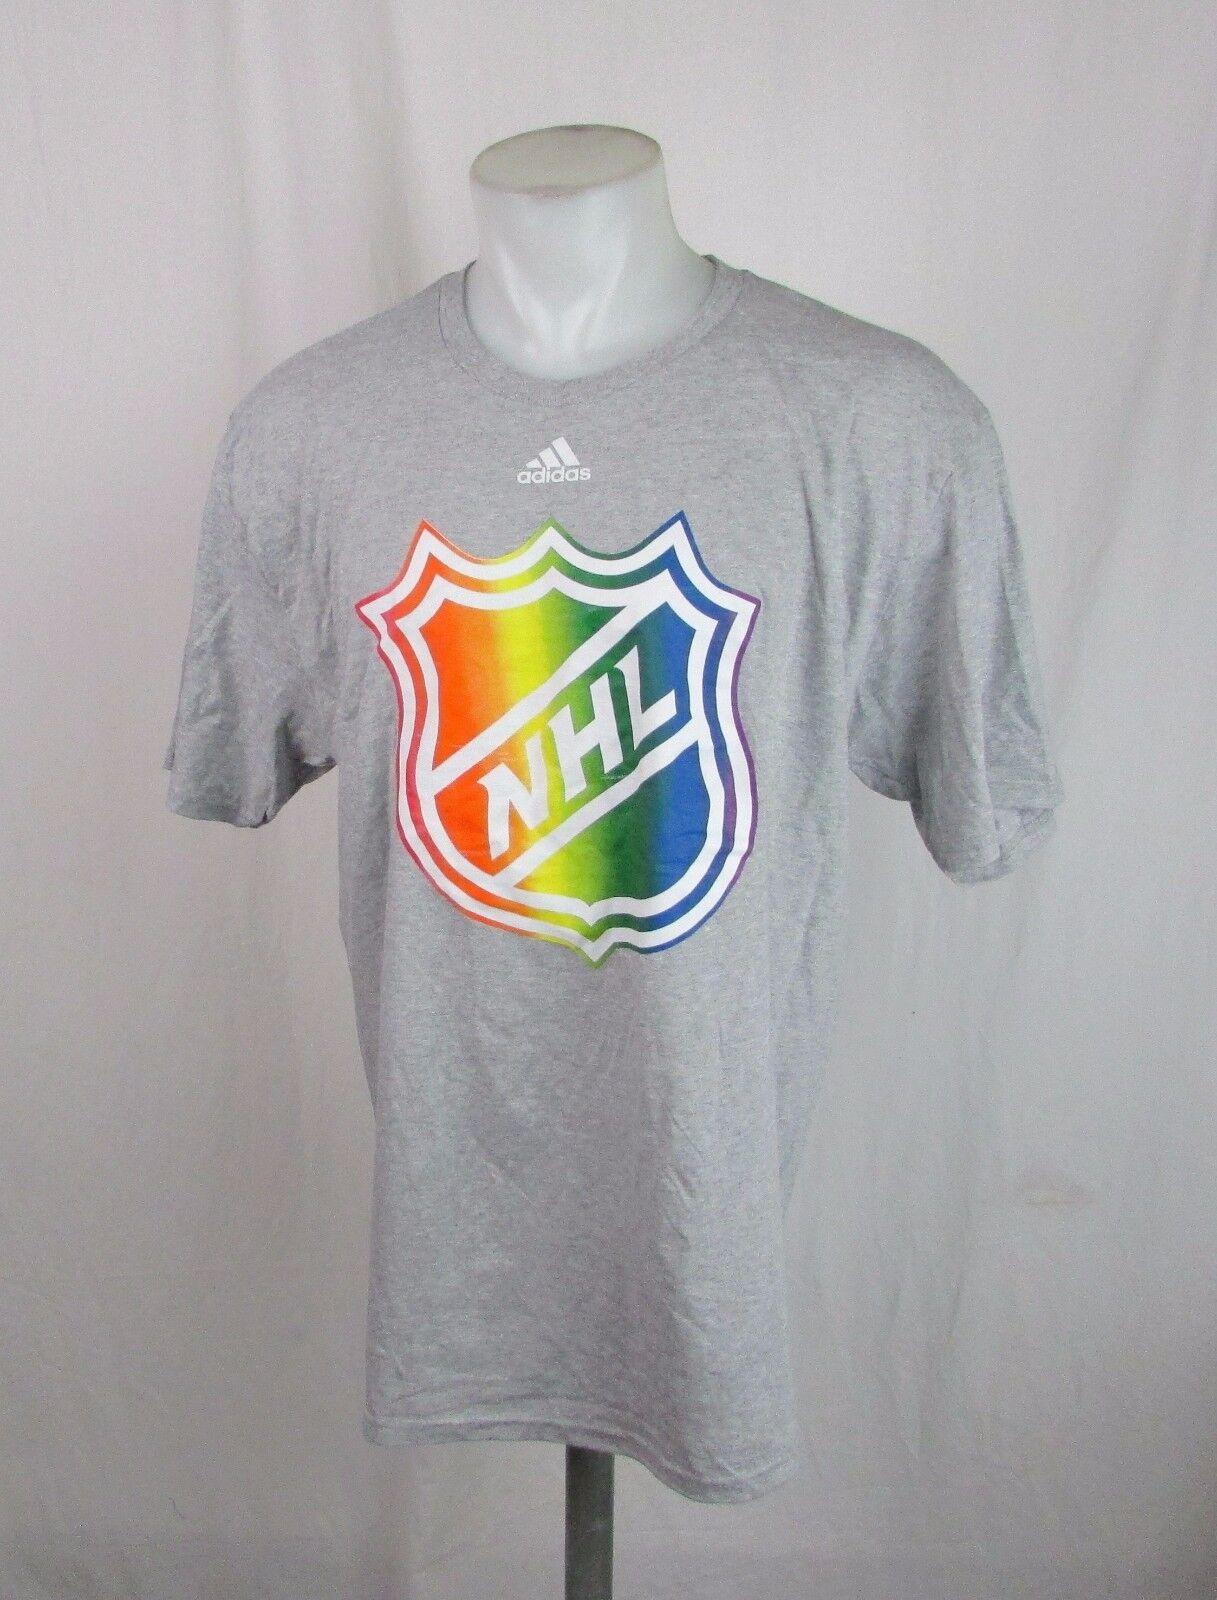 LNH Hommes L, XL Gris Rainbow Chemise à manches courtes avec logo NHL Adidas A12MLF